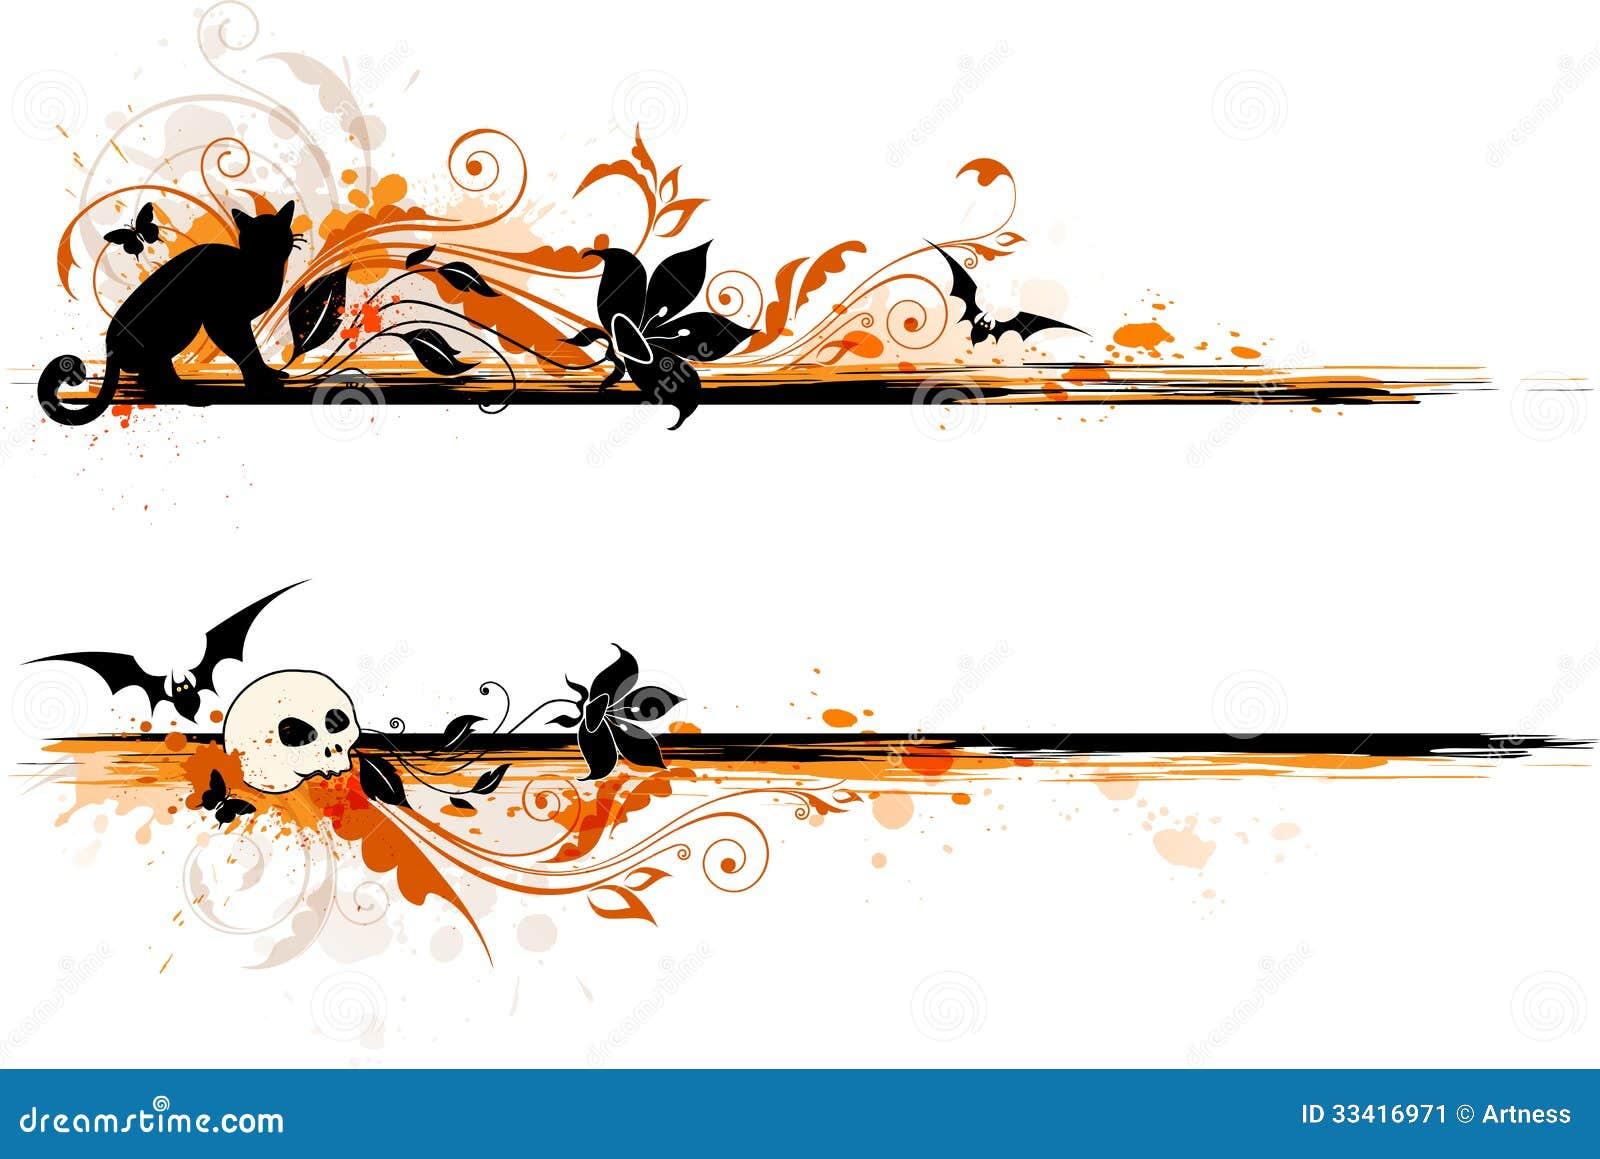 Halloween Banner Stock Image - Image: 33416971